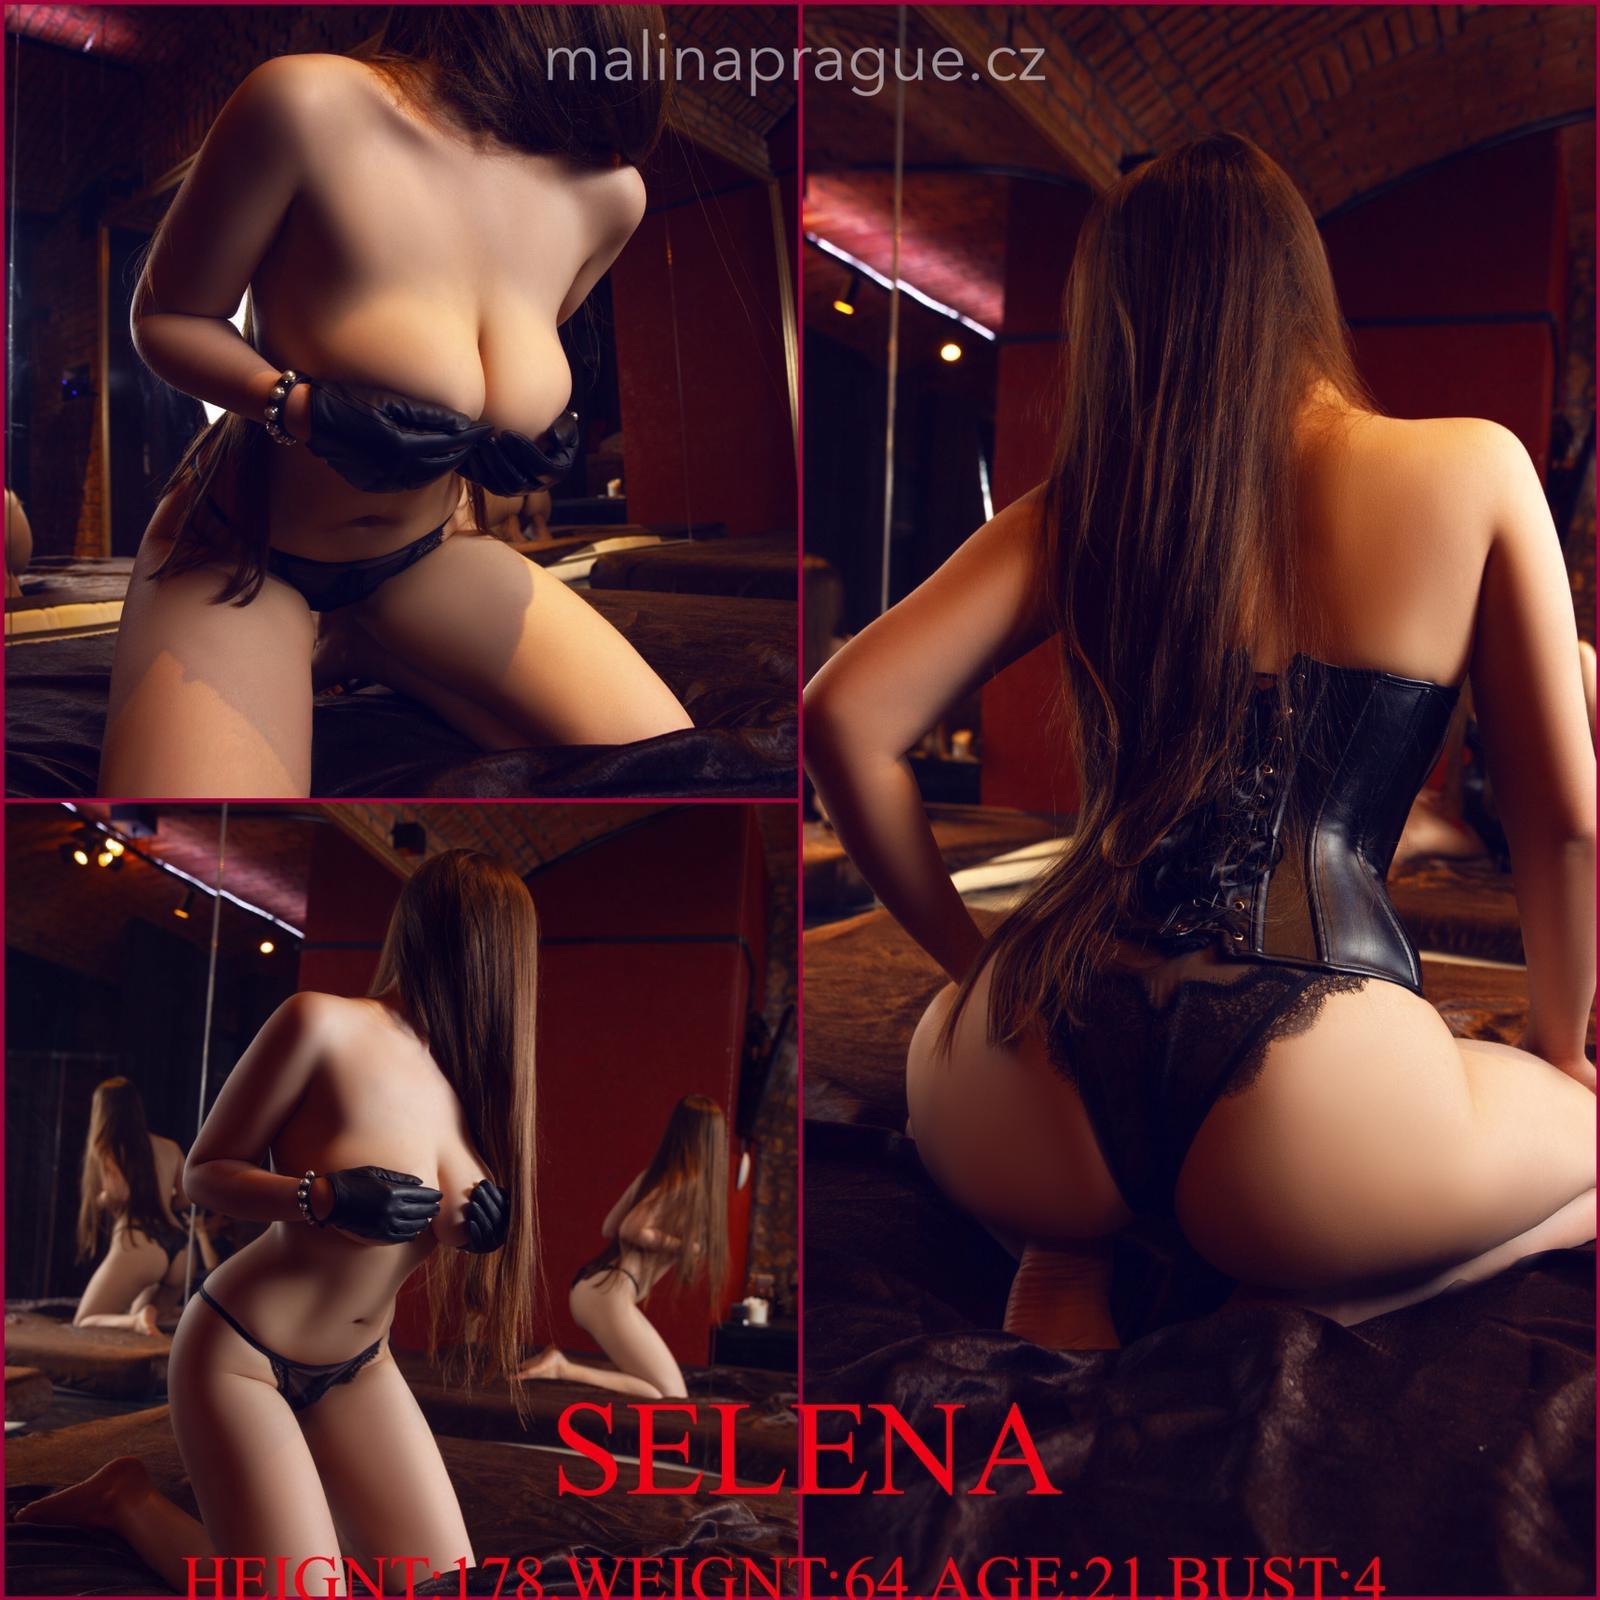 Selena erotic masseuse